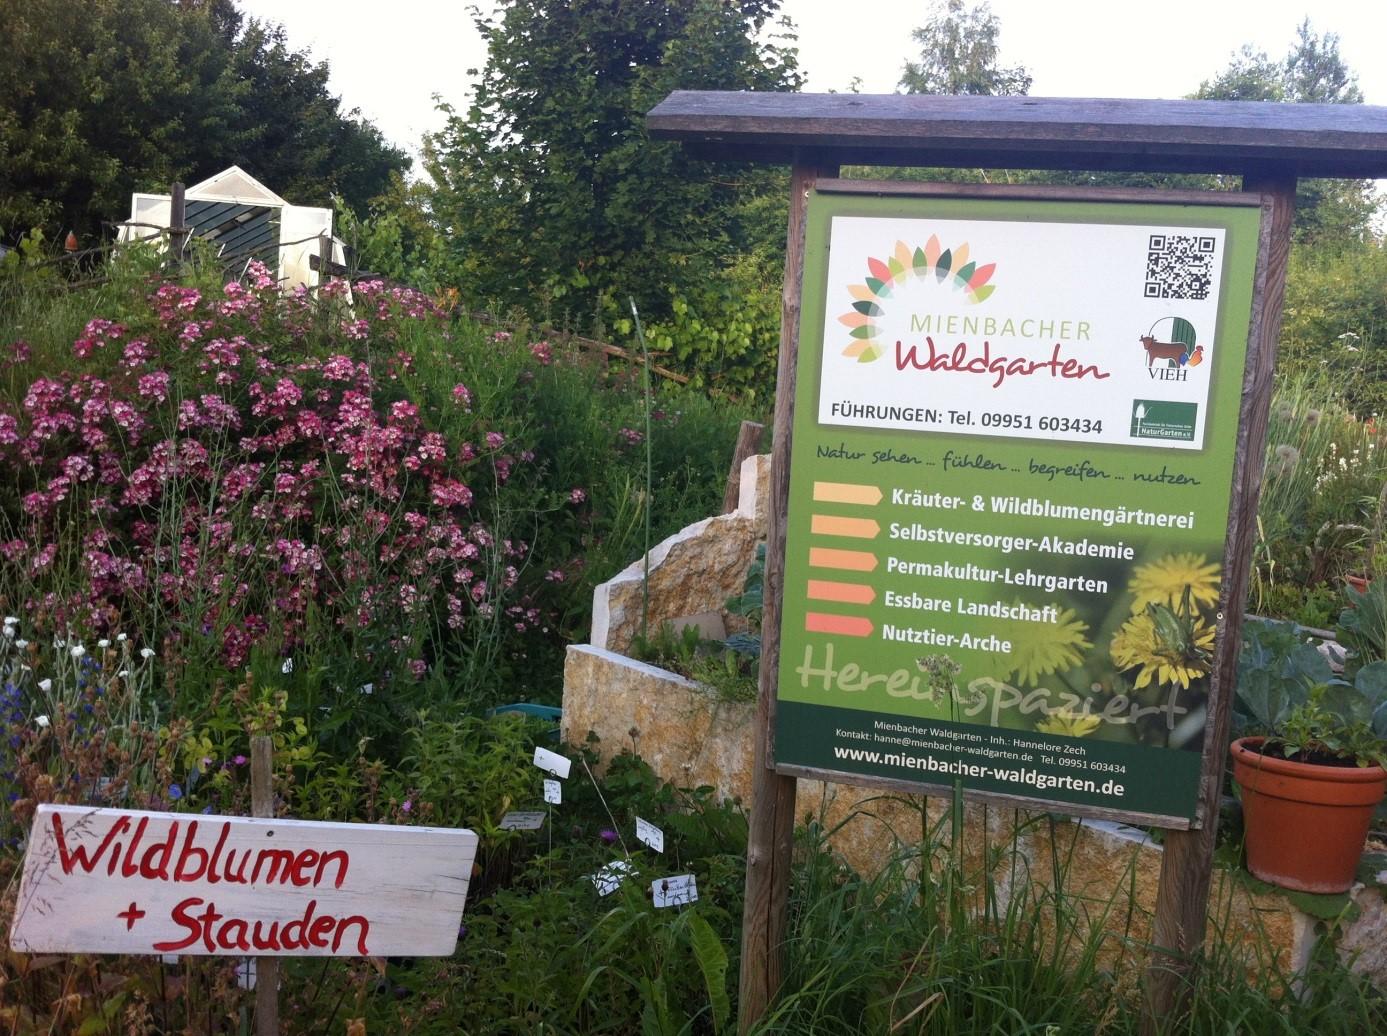 Mienbacher Waldgarten-Selbstversorger-Akademie 1